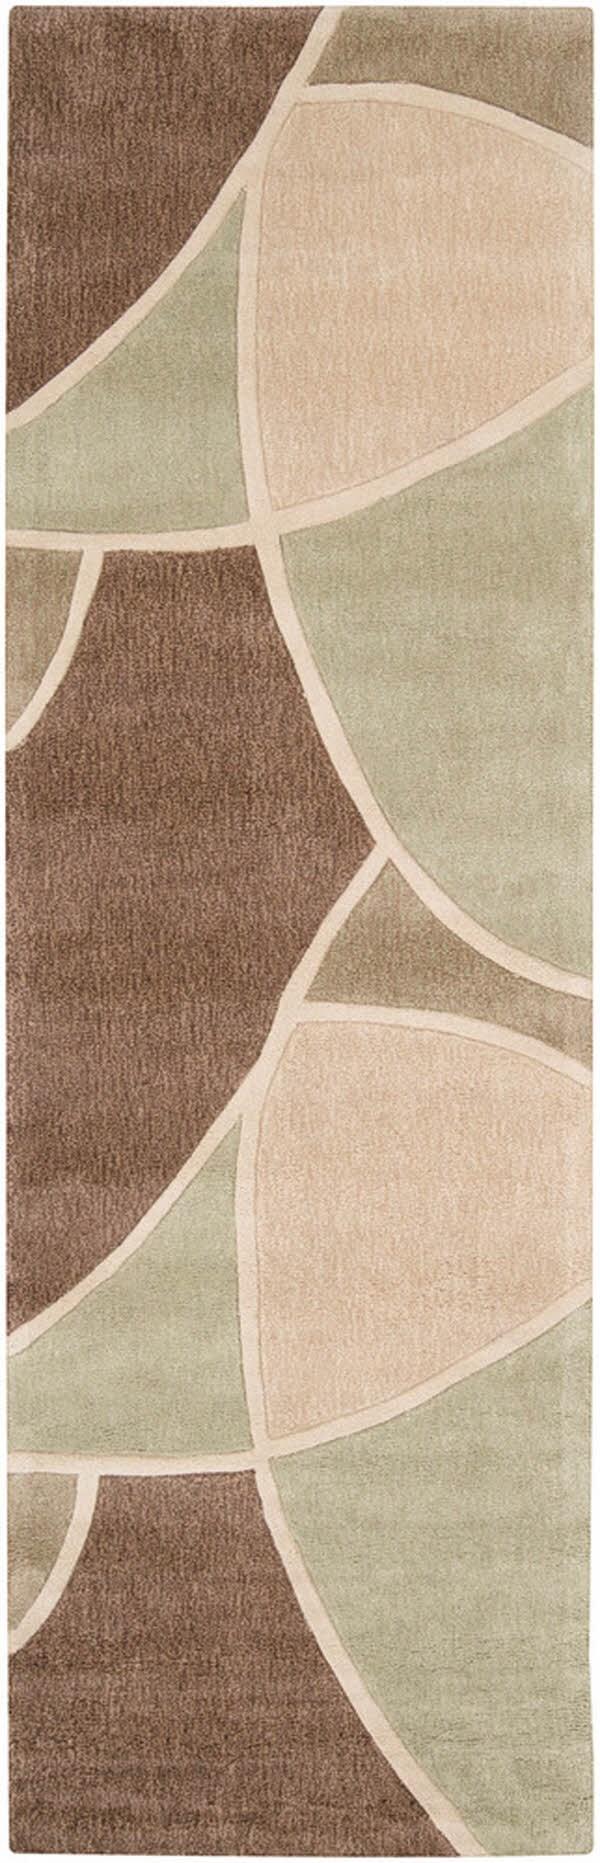 Brown, Tan, Light Green Contemporary / Modern Area Rug